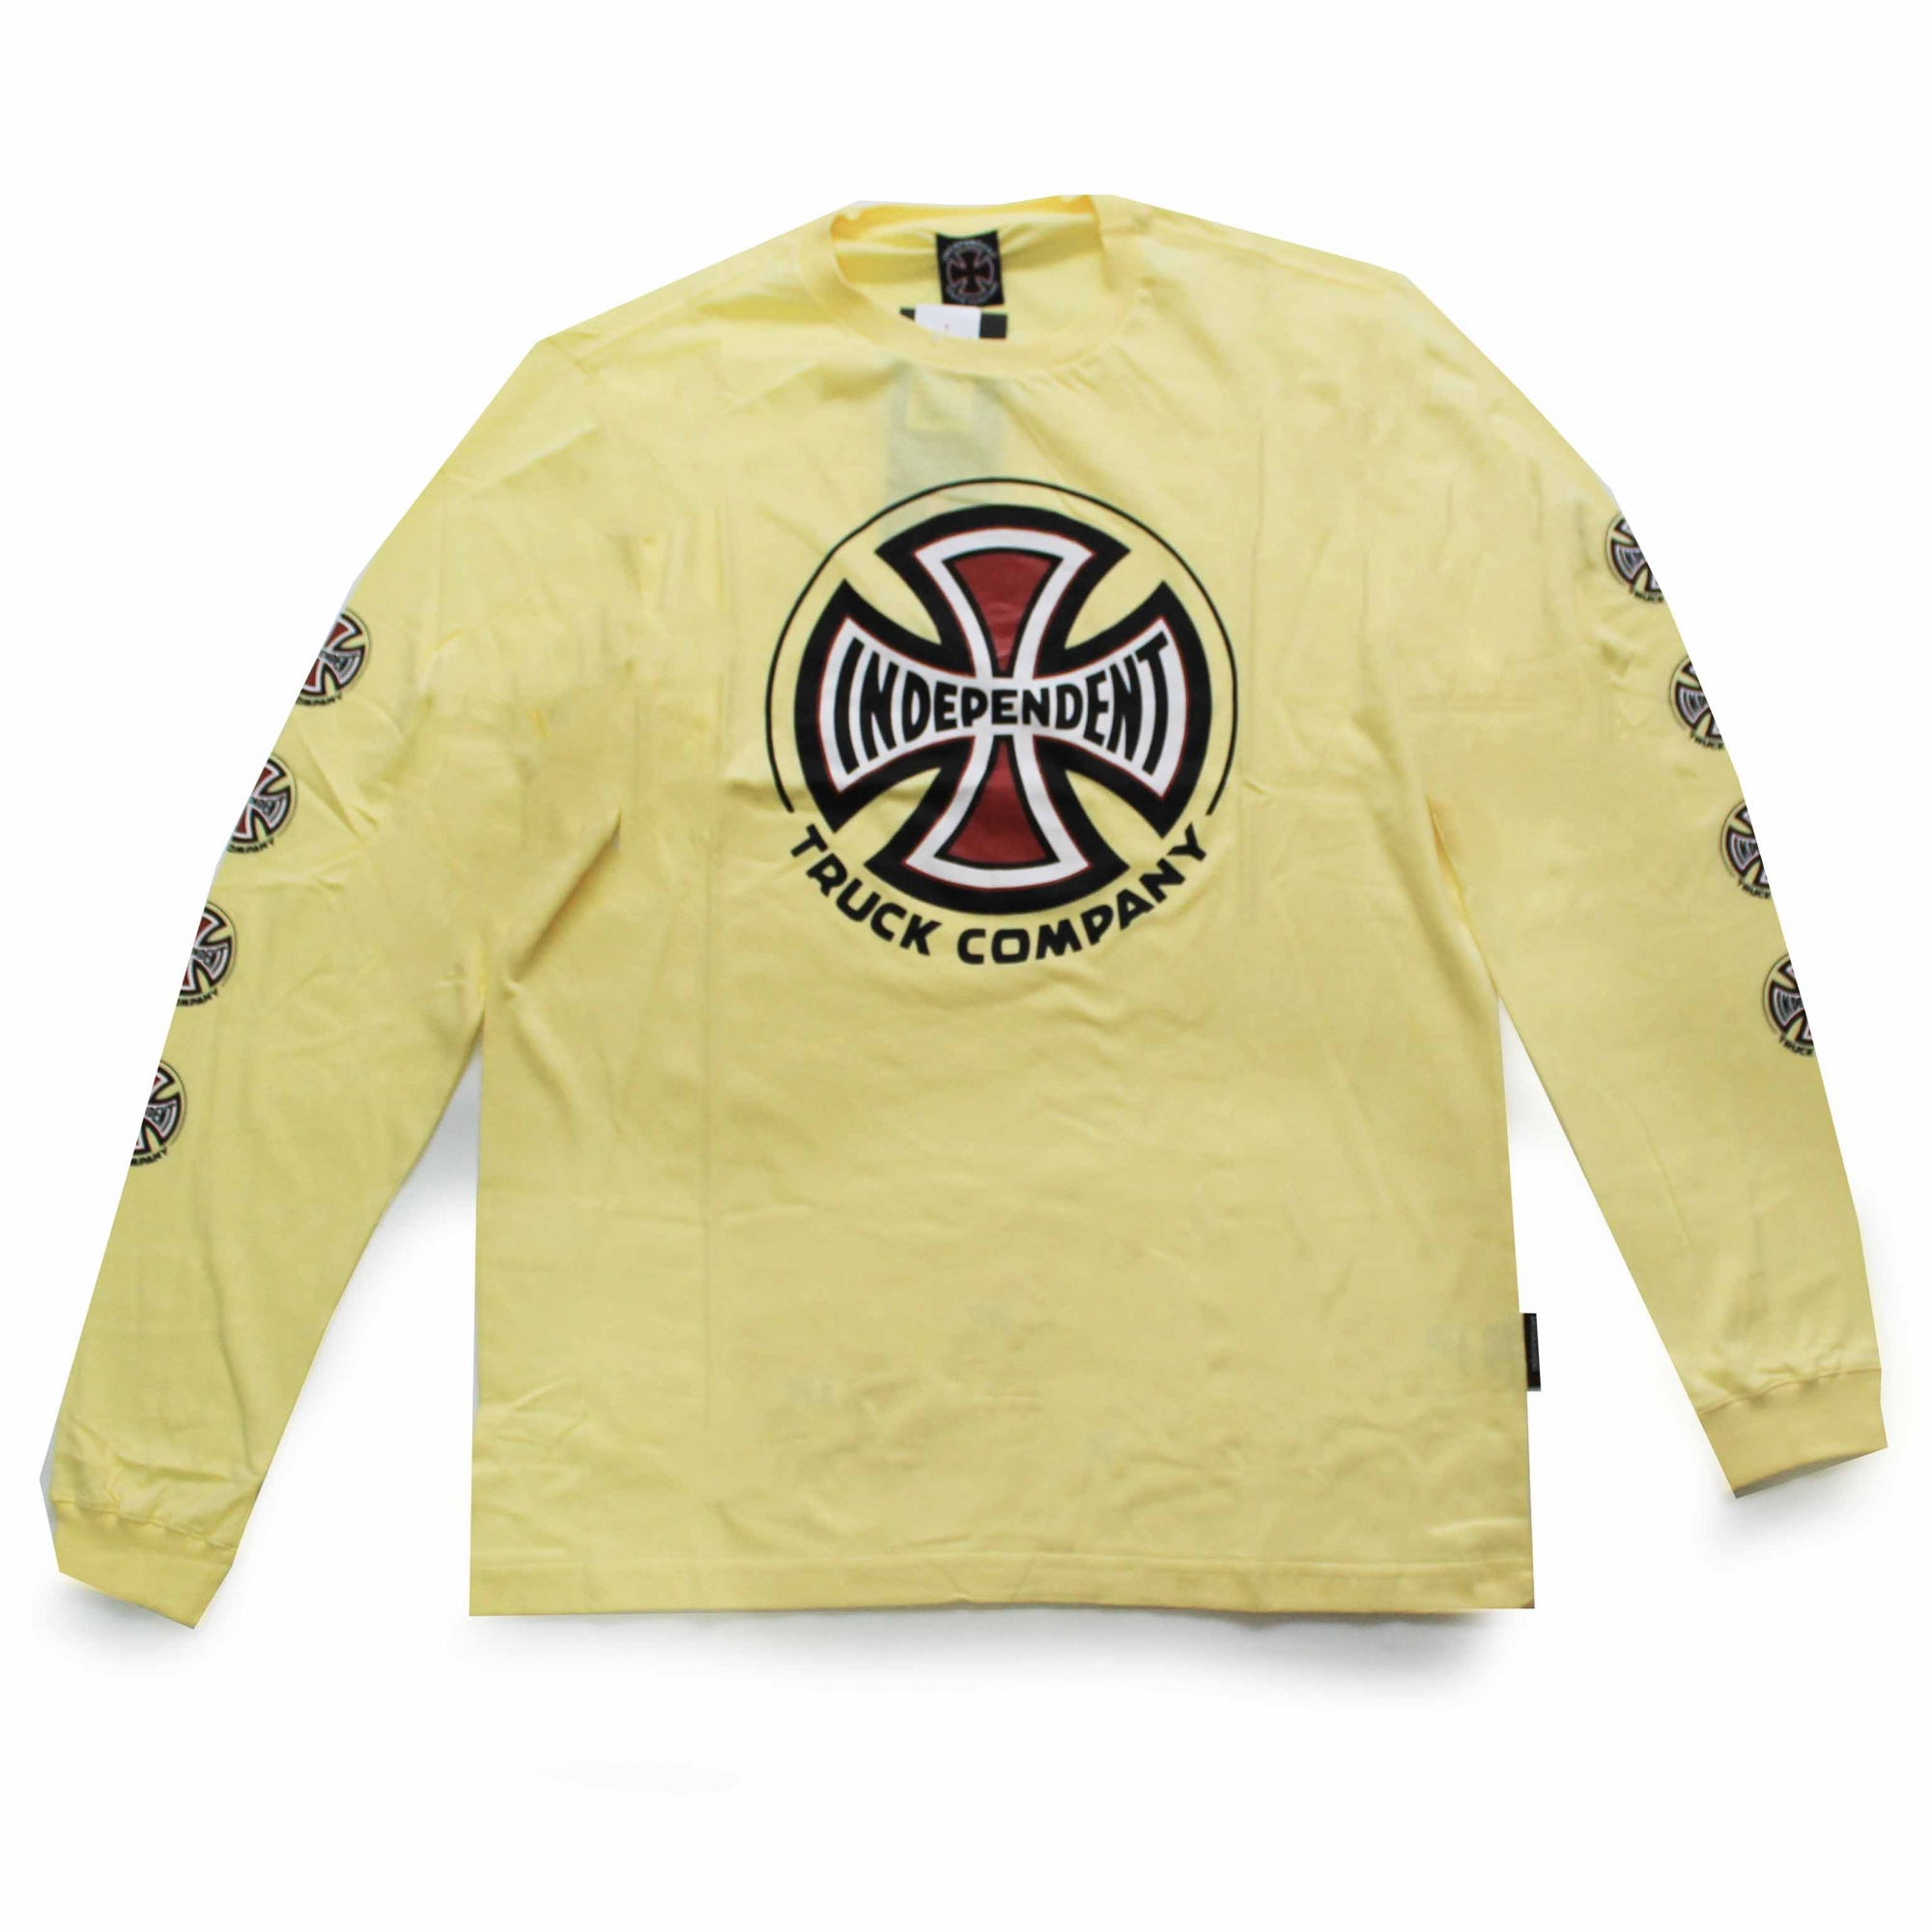 Camiseta Manga Longa Independent Truck Co 3 Colors - Amarelo Claro